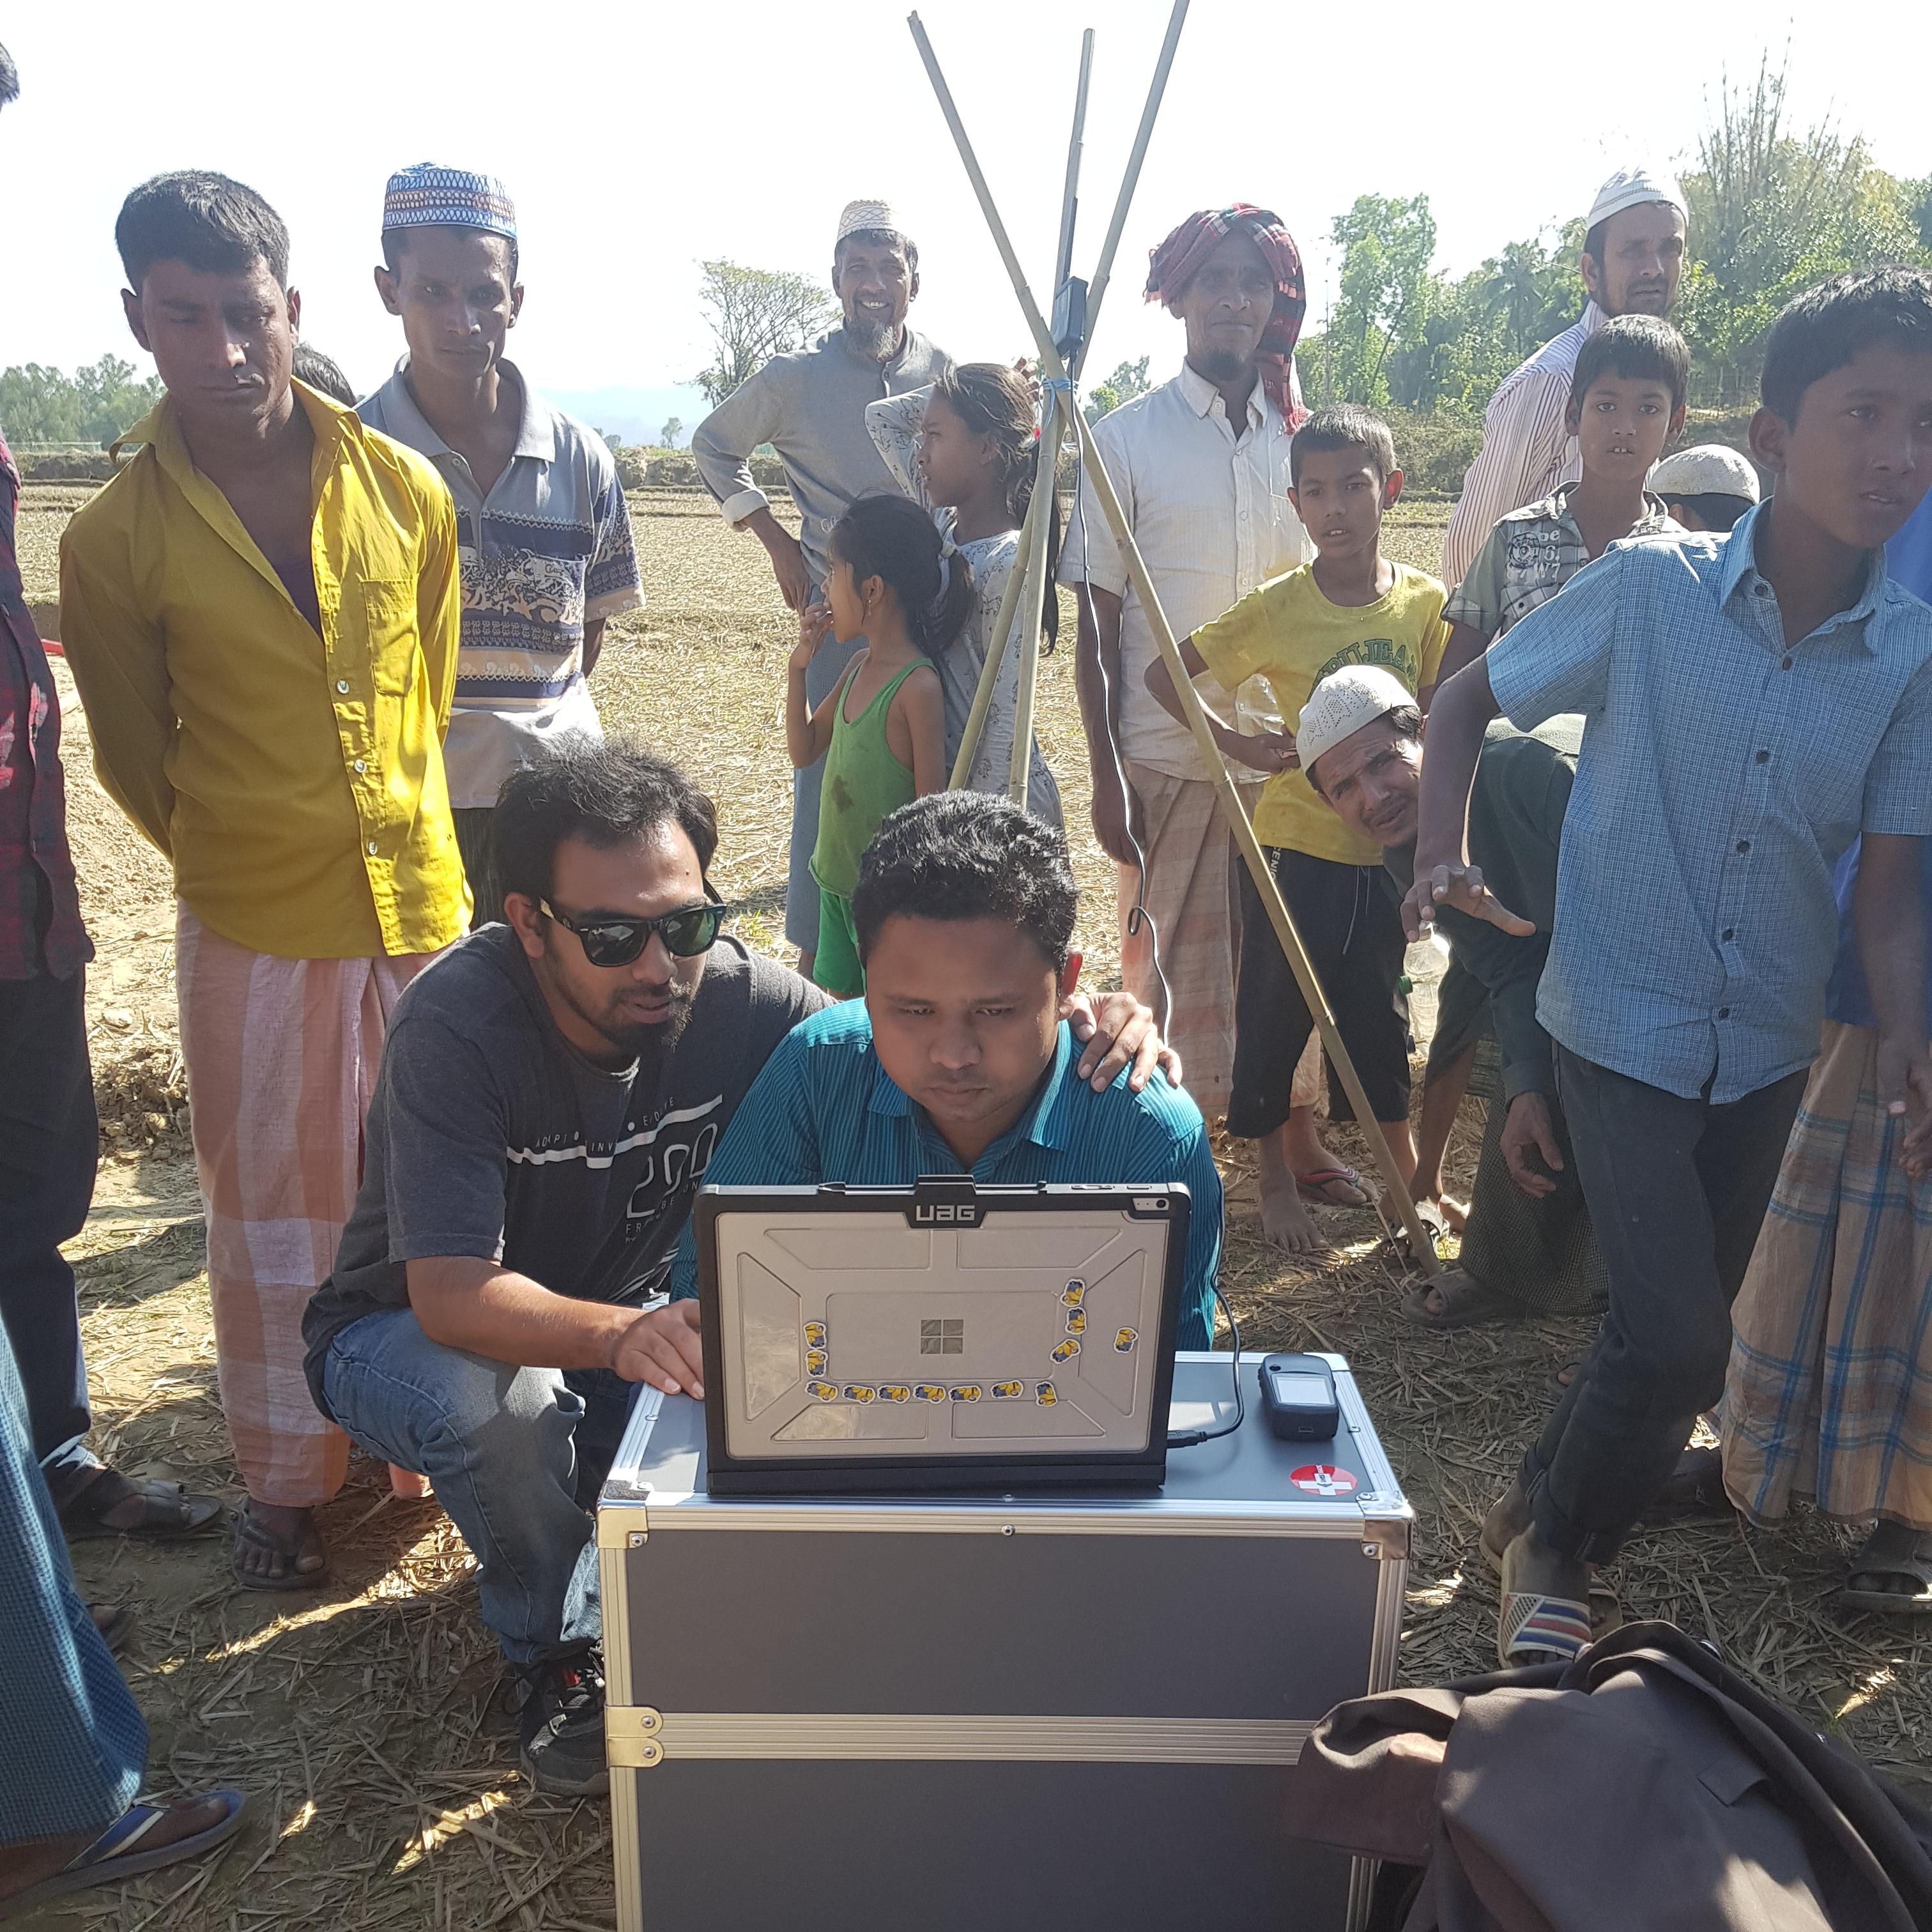 Working with Pix4Dmapper in the field